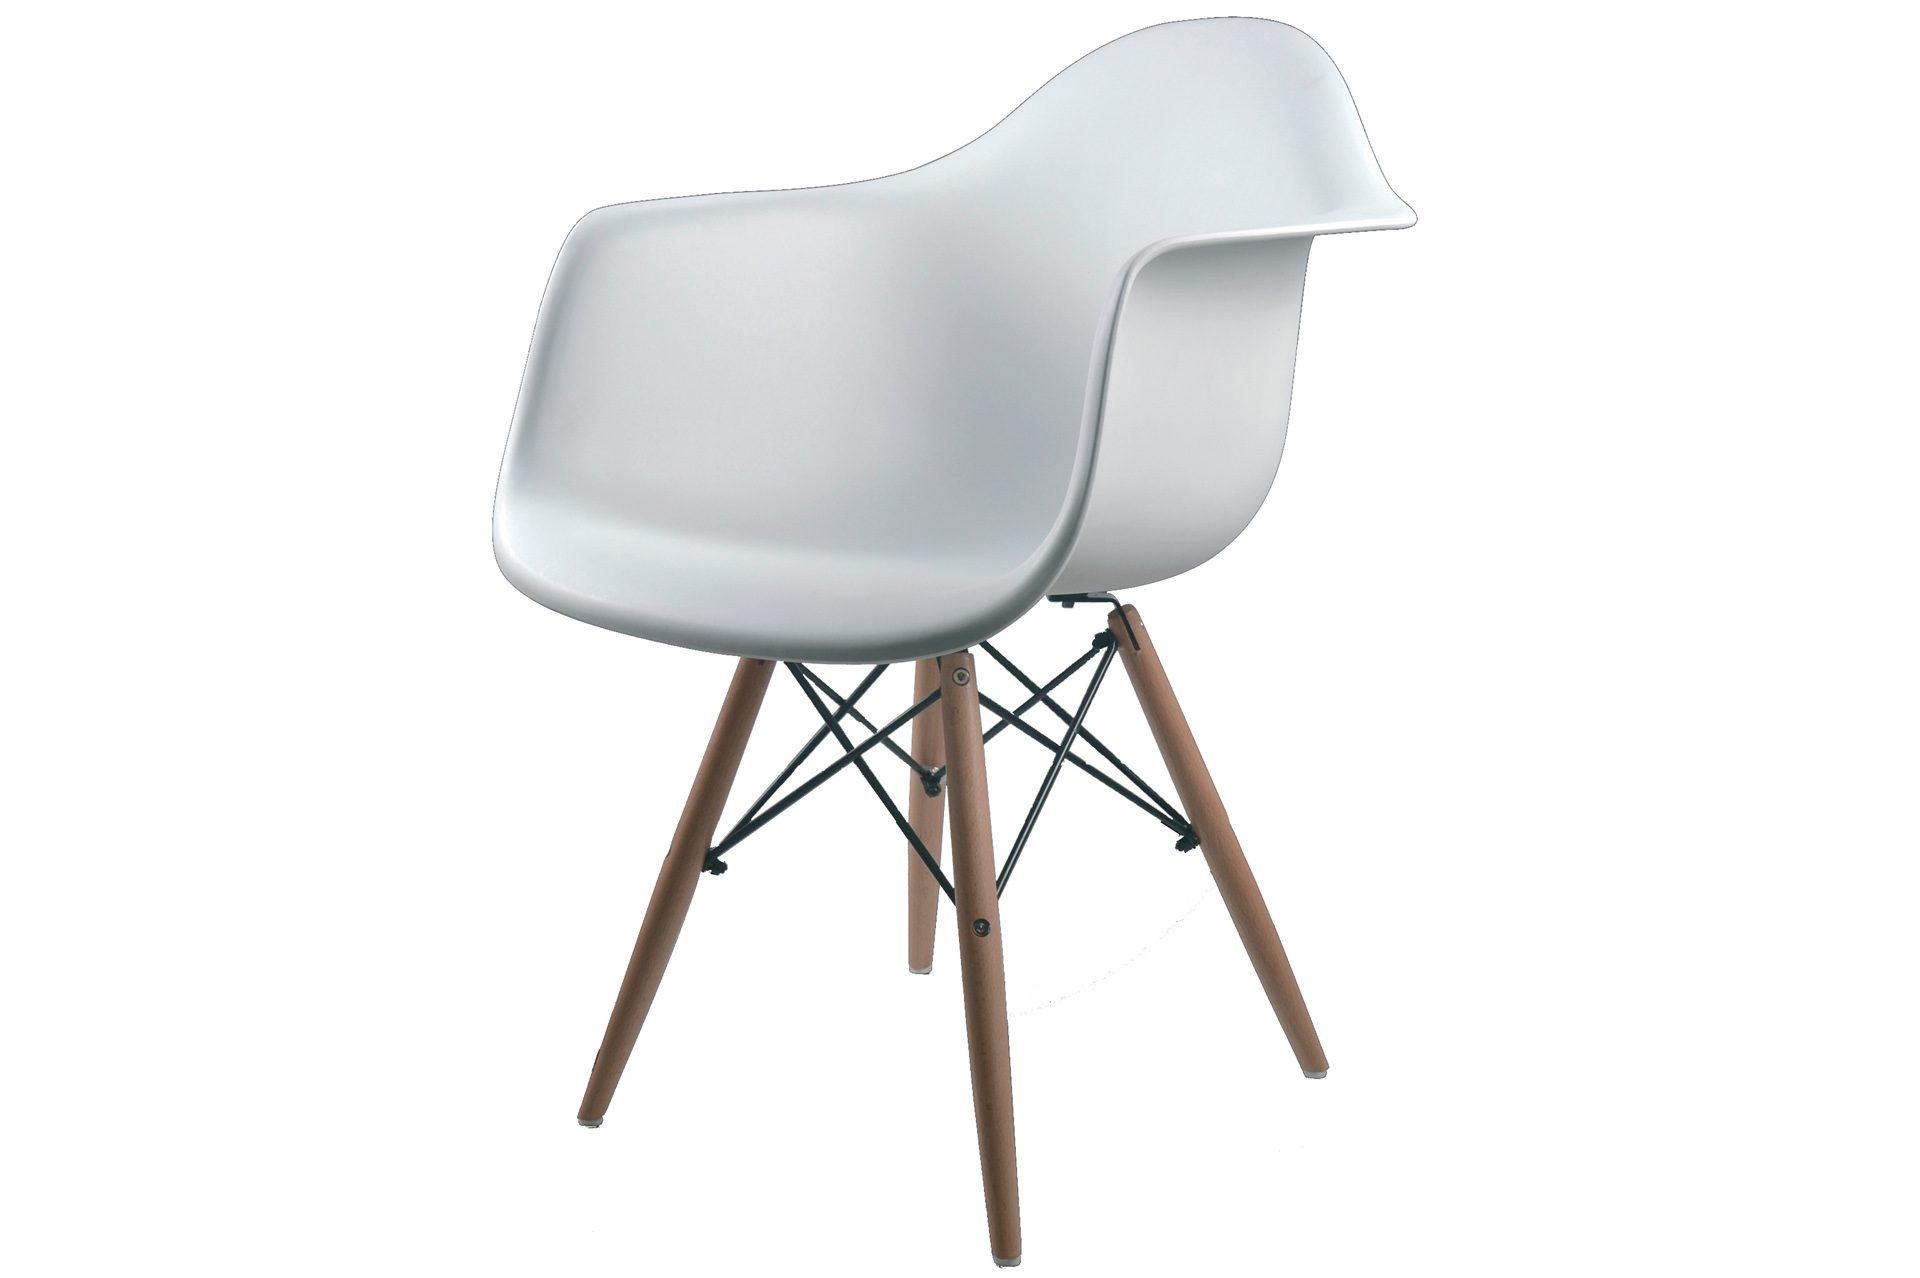 Europe Style Стул Y-982 белый europe style стол dt 903 белый